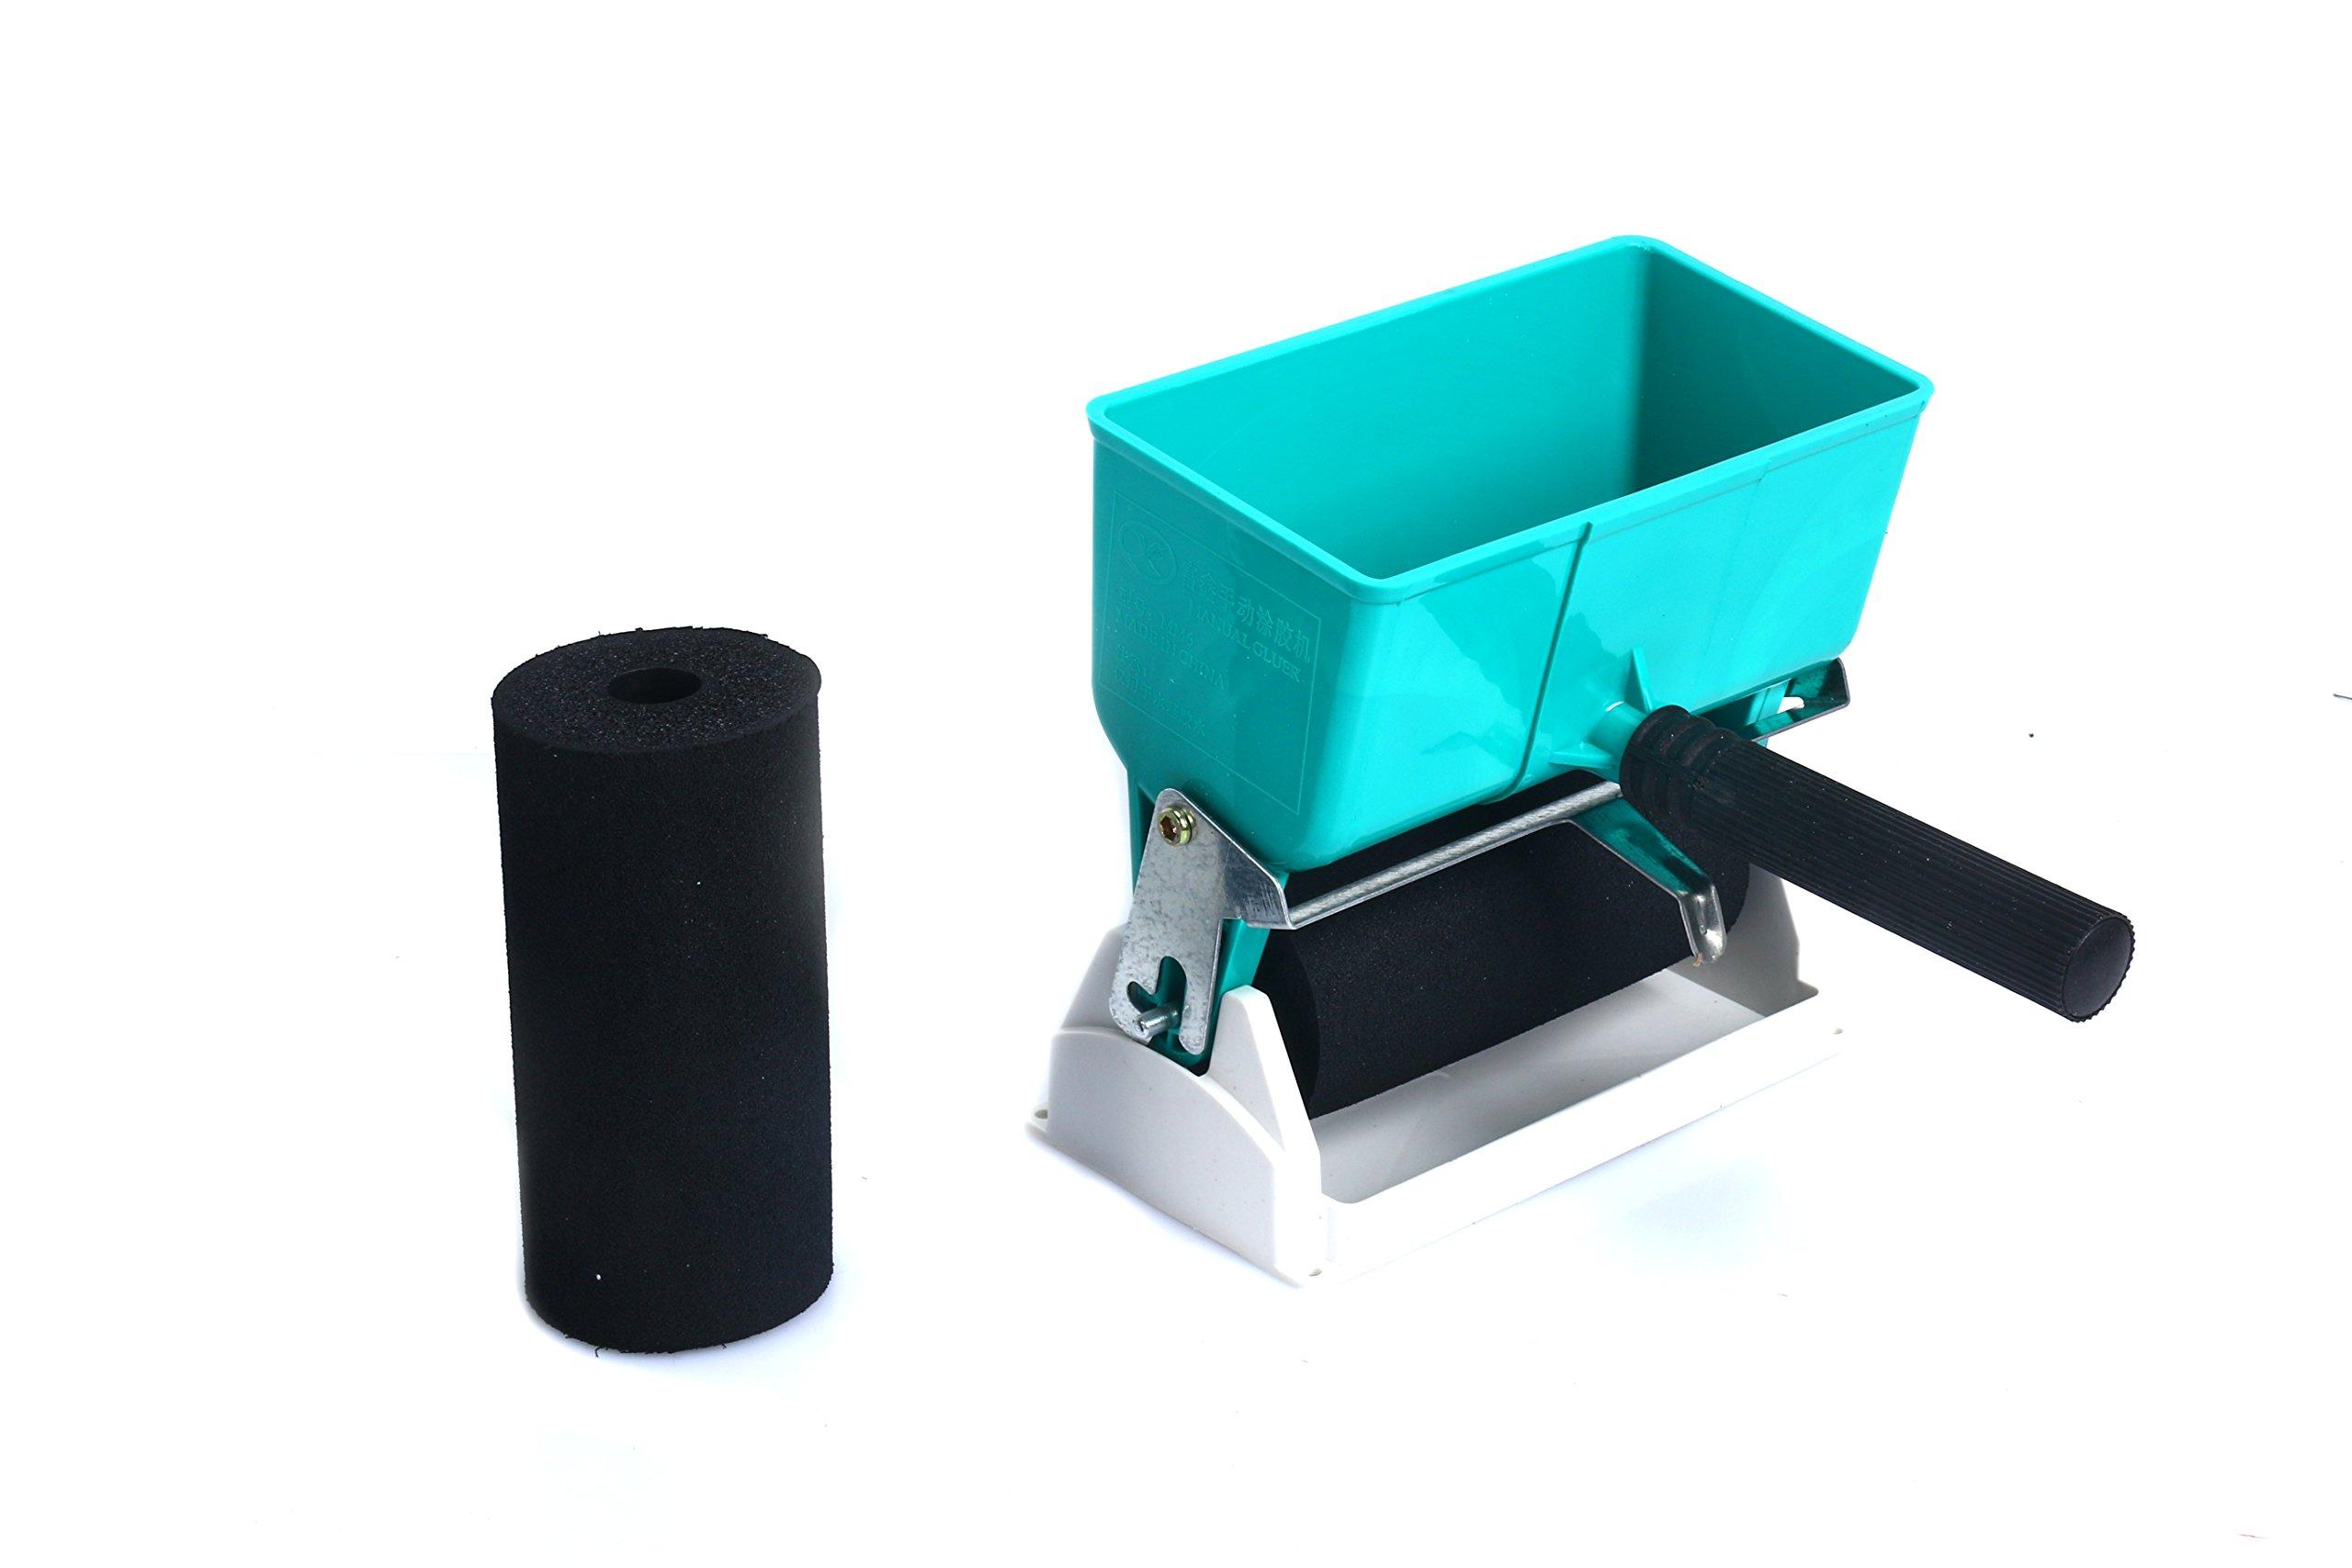 YaeTek Professional Handheld Glue Spreader Adjustable Glue Applicator Coated Glue Roller for Spreading Adhesives - PVC Glue Latex Wood Glue Applicable Leather Woodworking Carton Furniture (6 Inch)